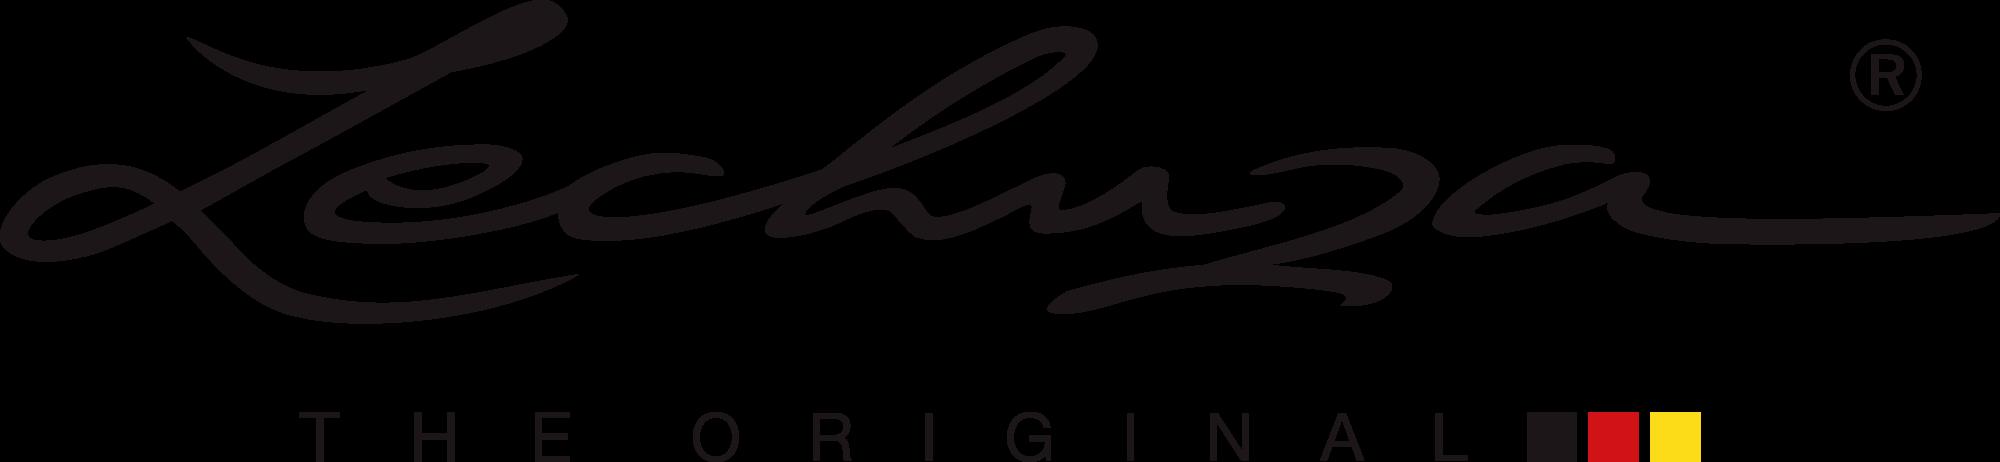 le_logo